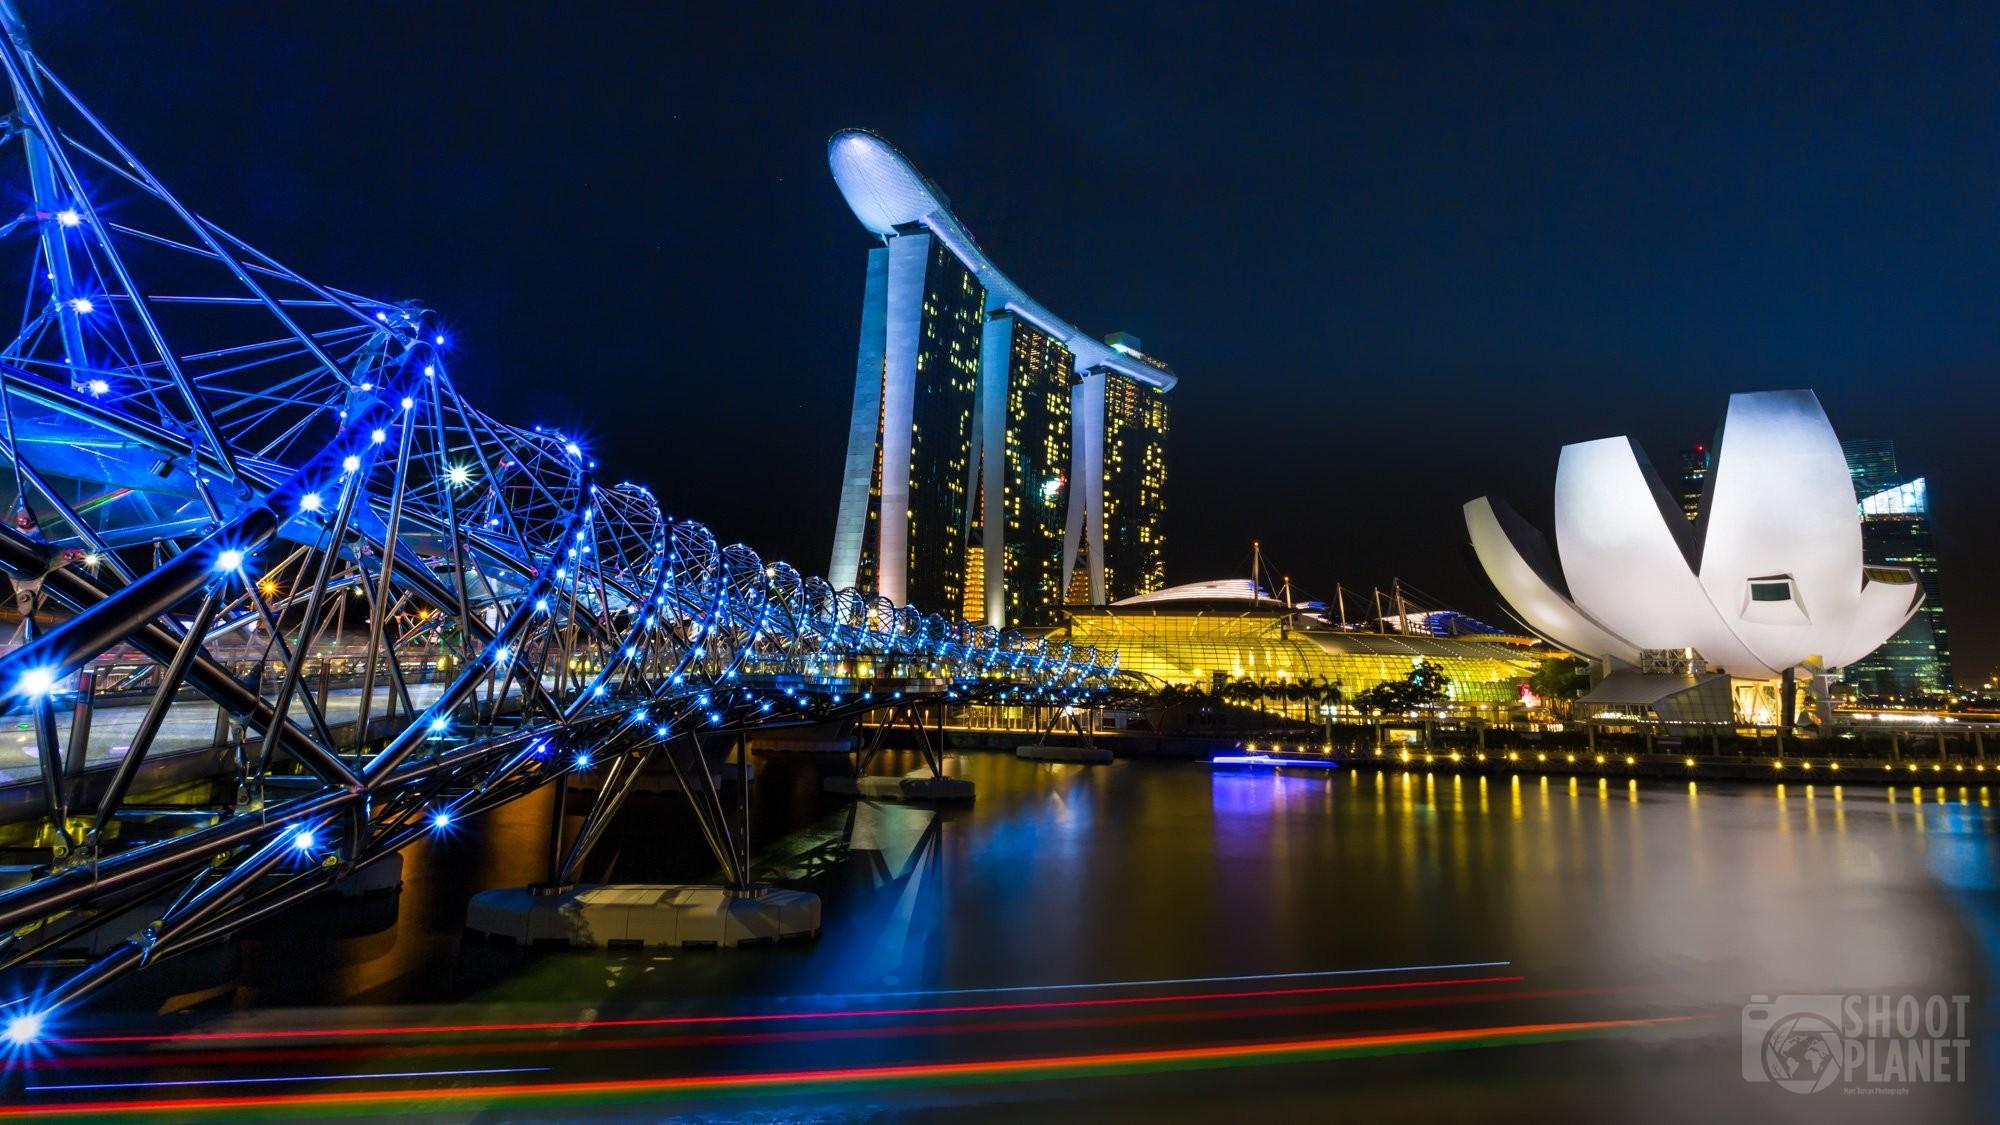 Helix bridge skyline at night, Singapore